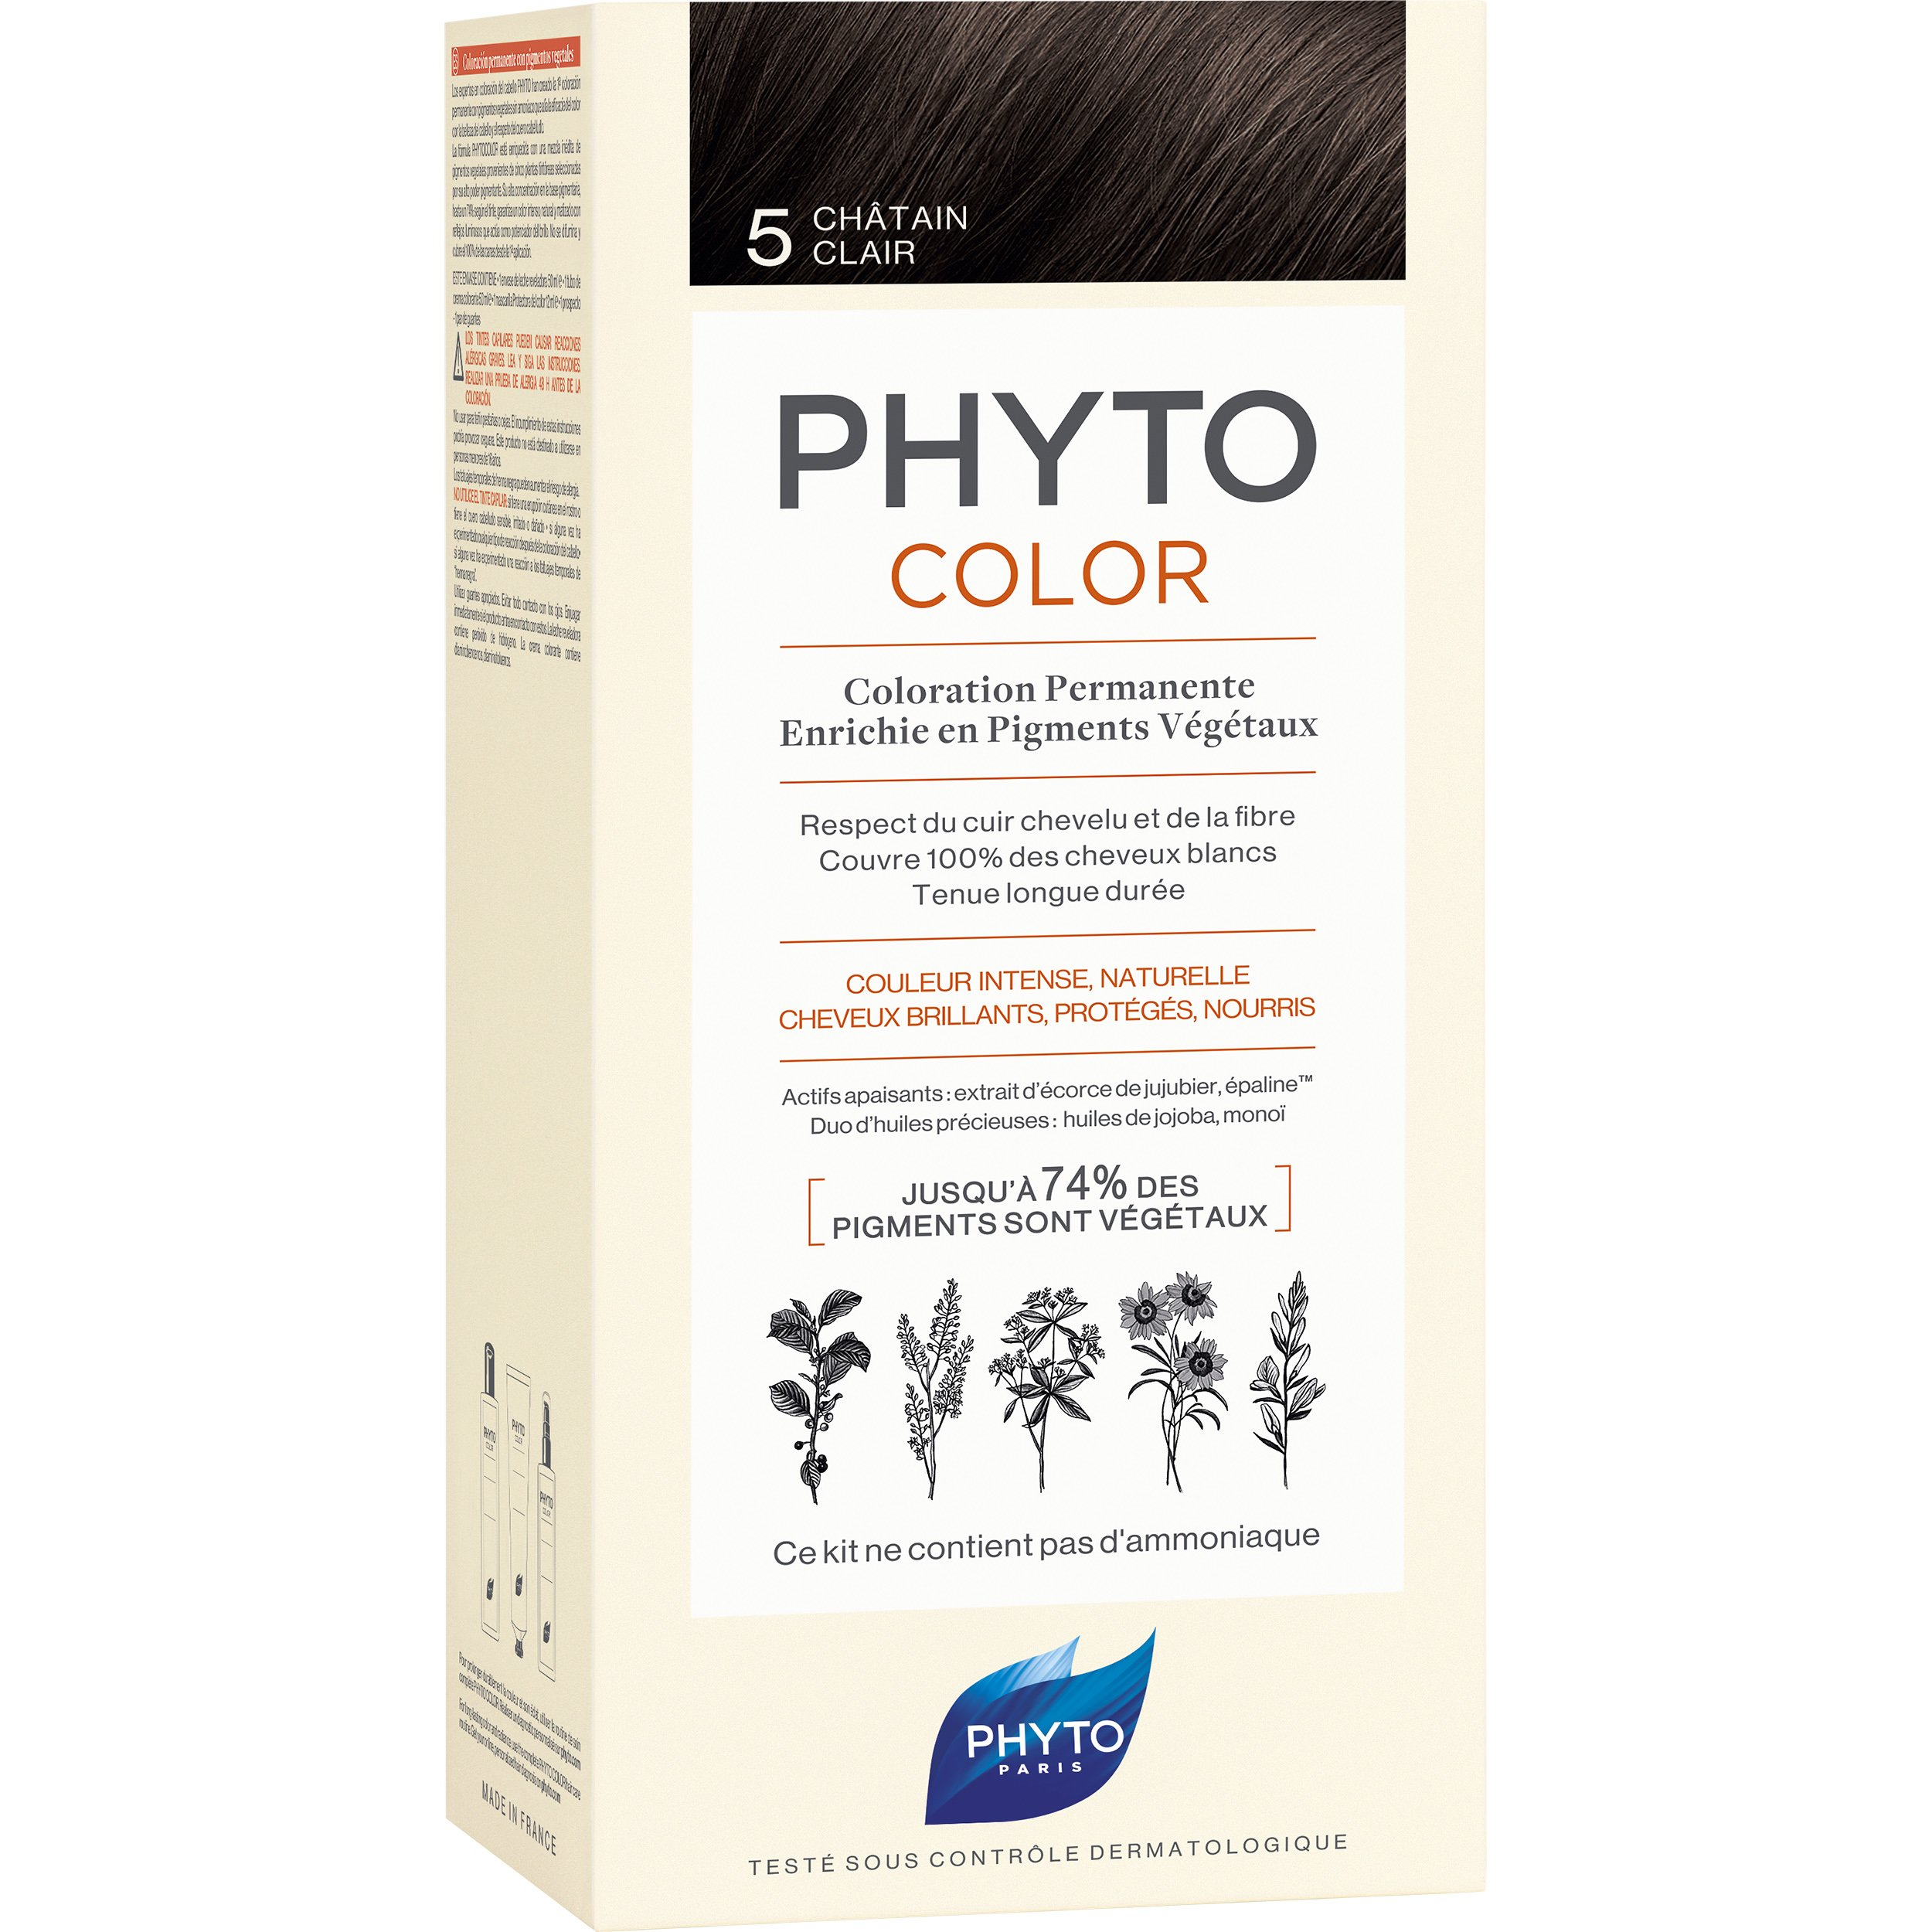 Phyto PhytoColor Coloration Permanente η No1 Μόνιμη Βαφή Μαλλιών Χωρίς Χρωστικές Ουσίες & Αμμωνία – 5 Καστανό Ανοιχτό